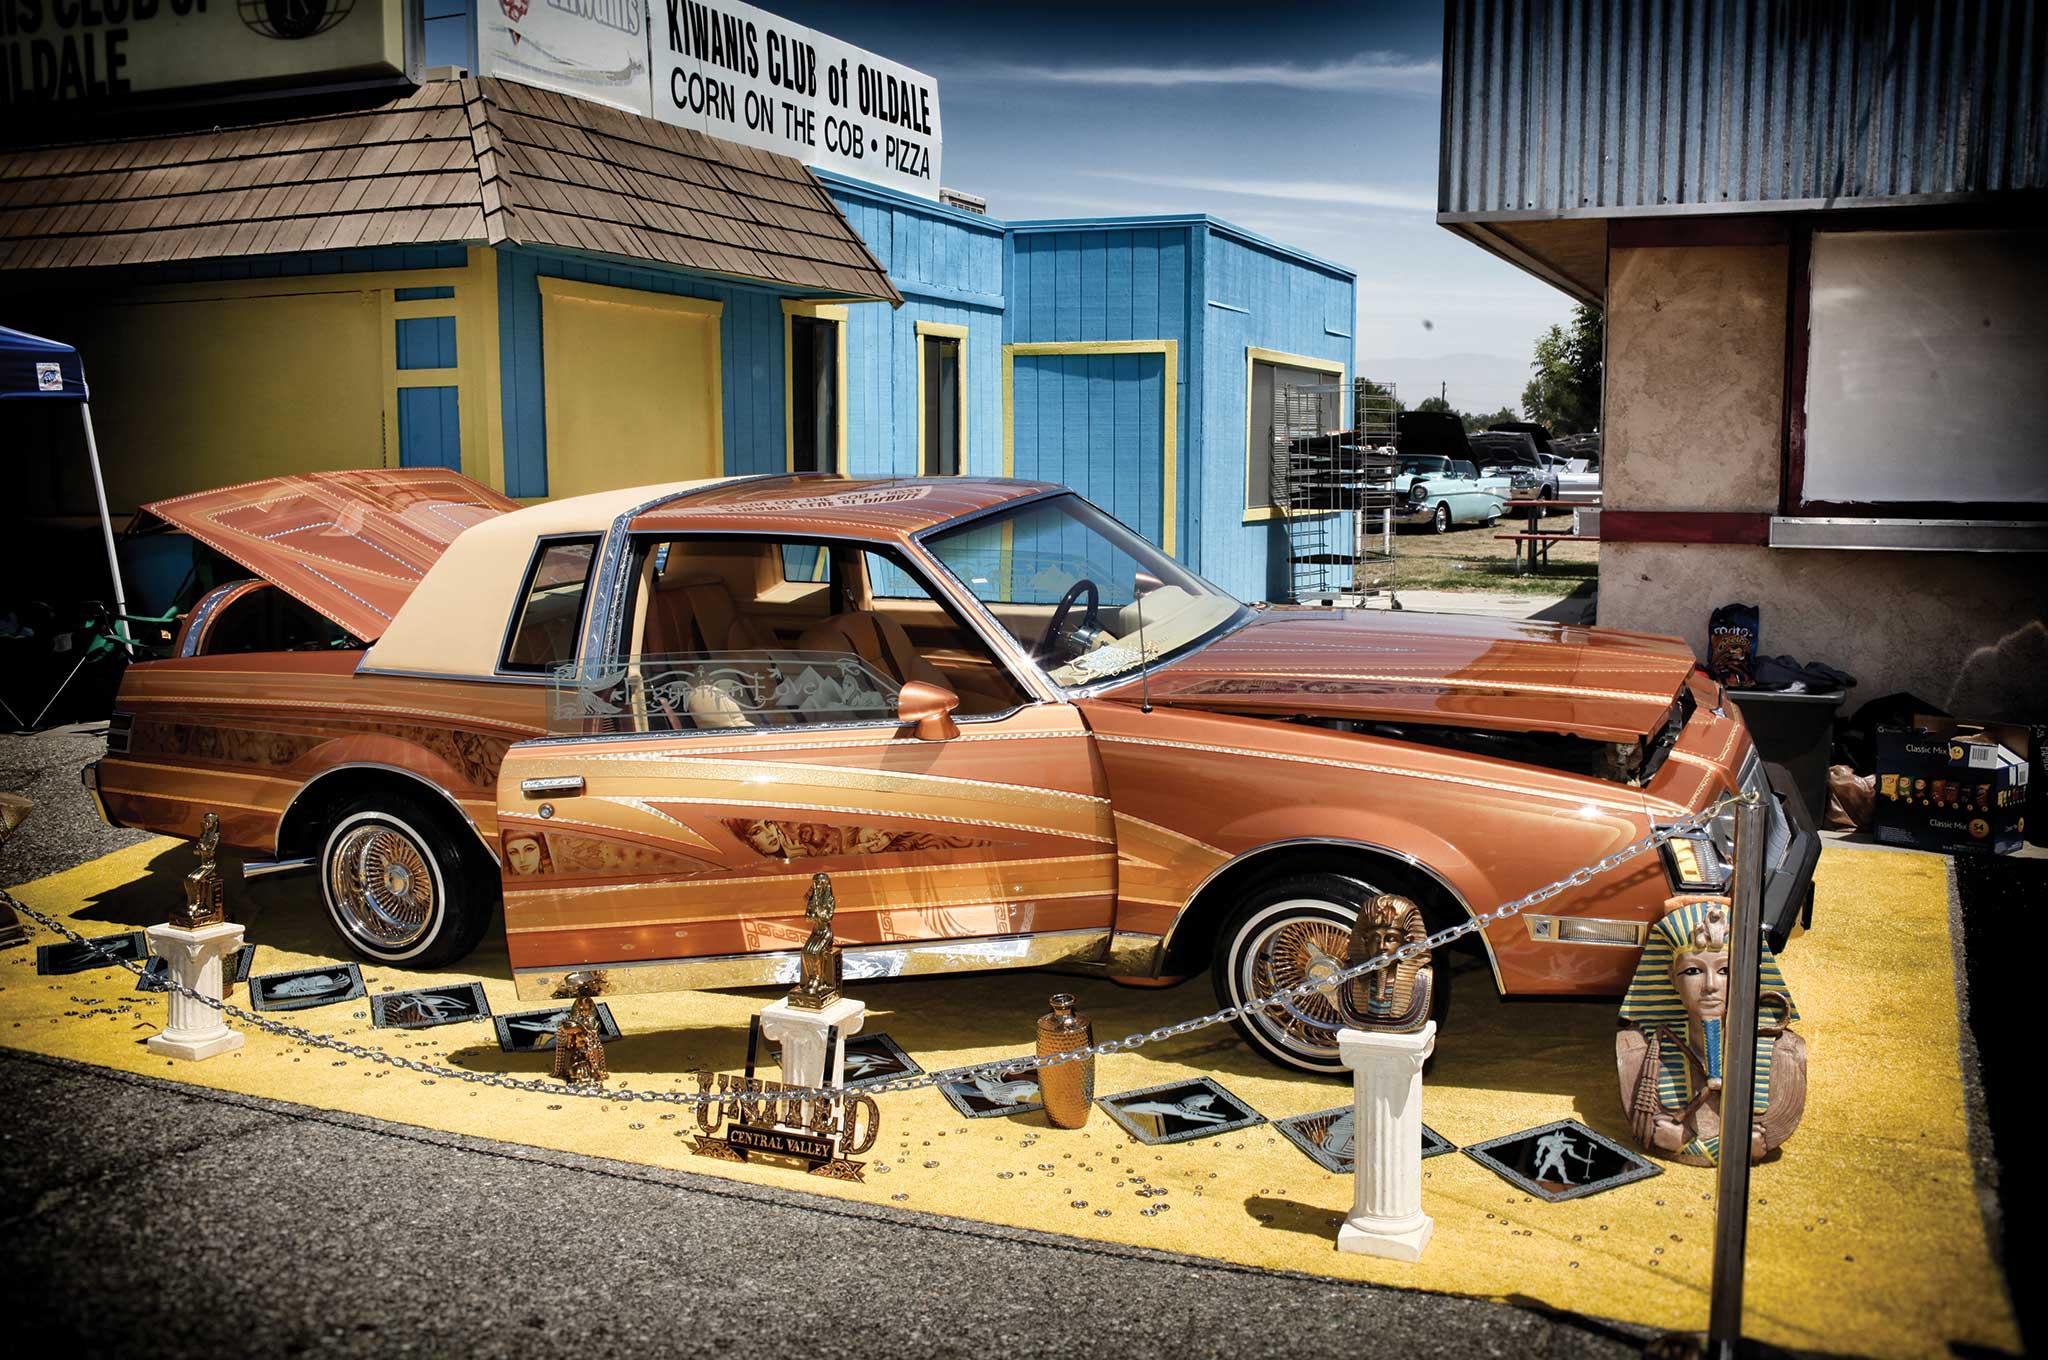 Carnales Unidos Bakersfield Show Buick Regal Lowrider - Bakersfield car show